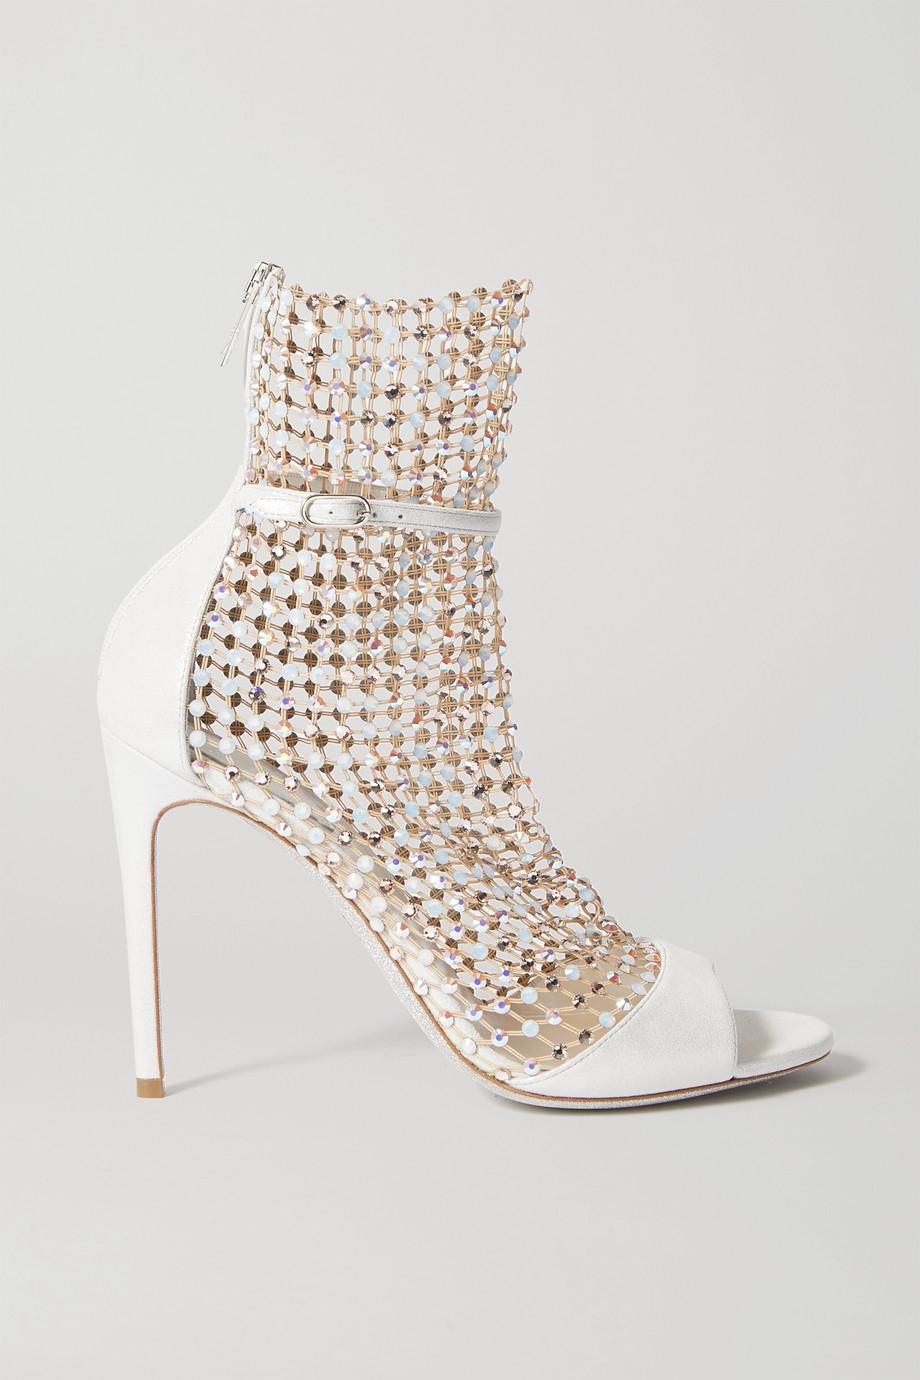 René Caovilla Galaxia 水晶缀饰网布金属感皮革凉鞋